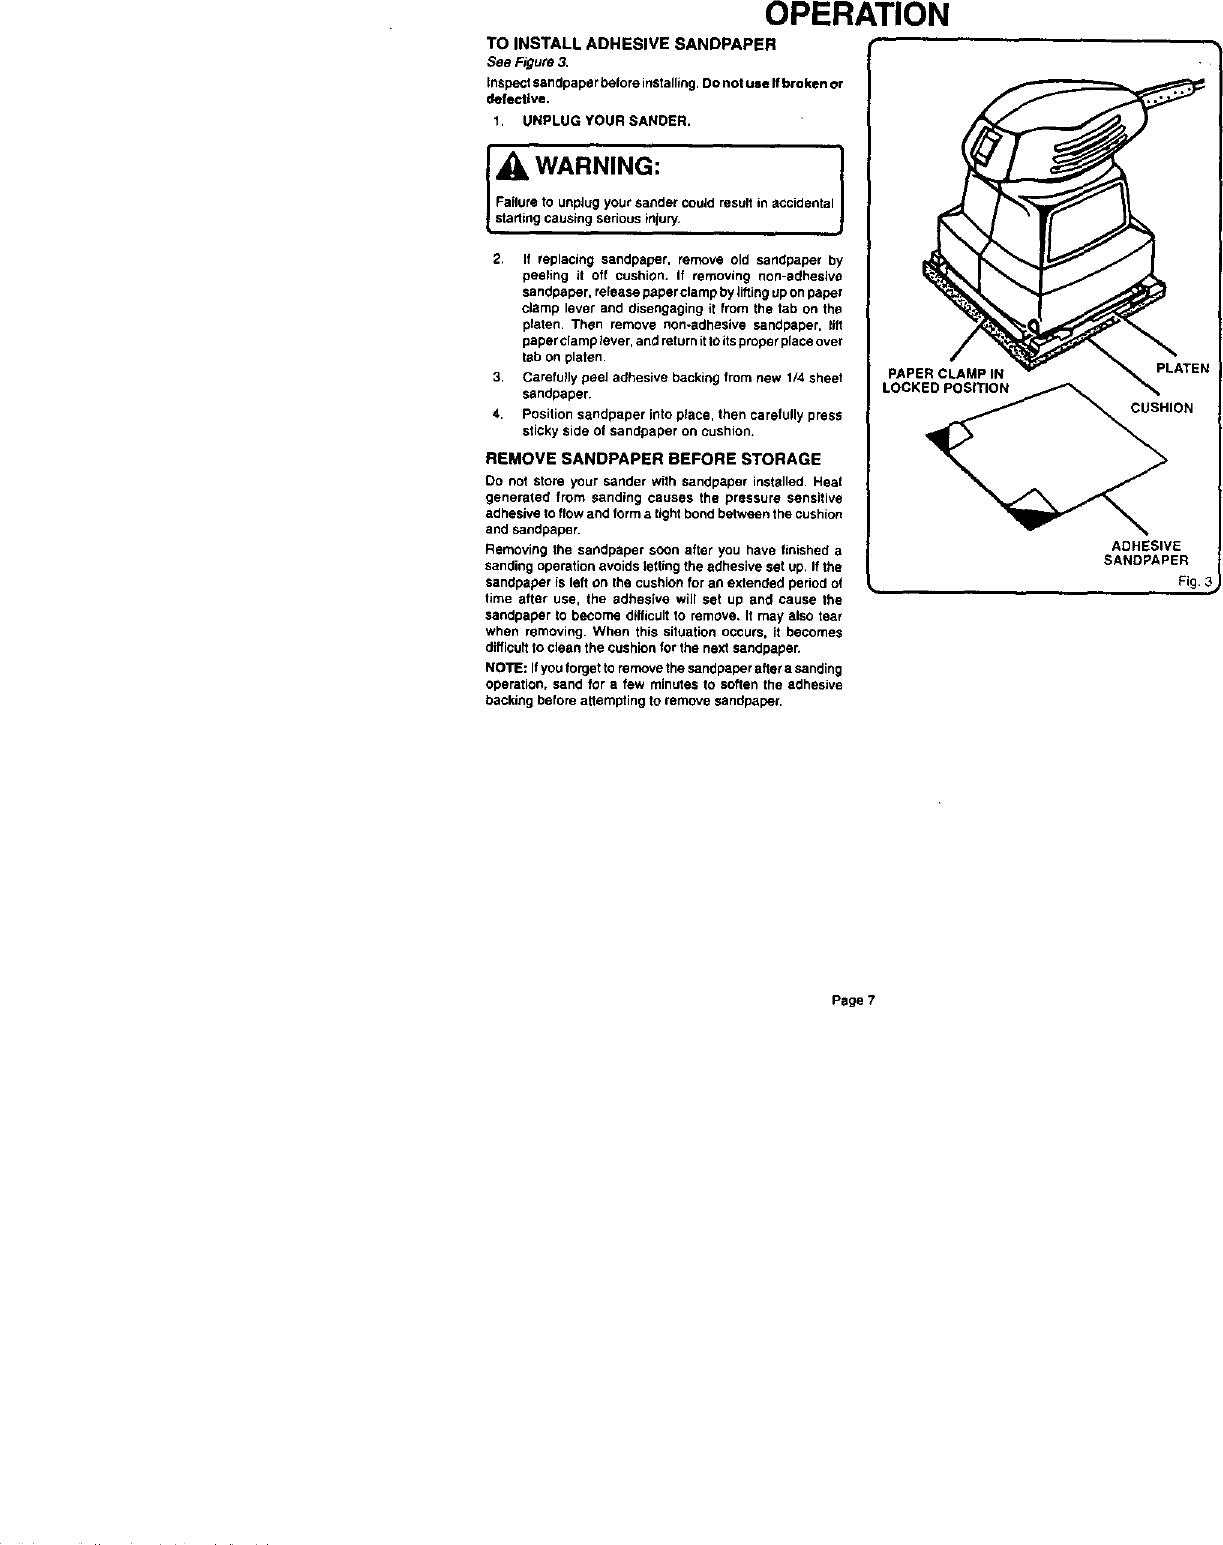 Craftsman 315116070 User Manual SANDER Manuals And Guides